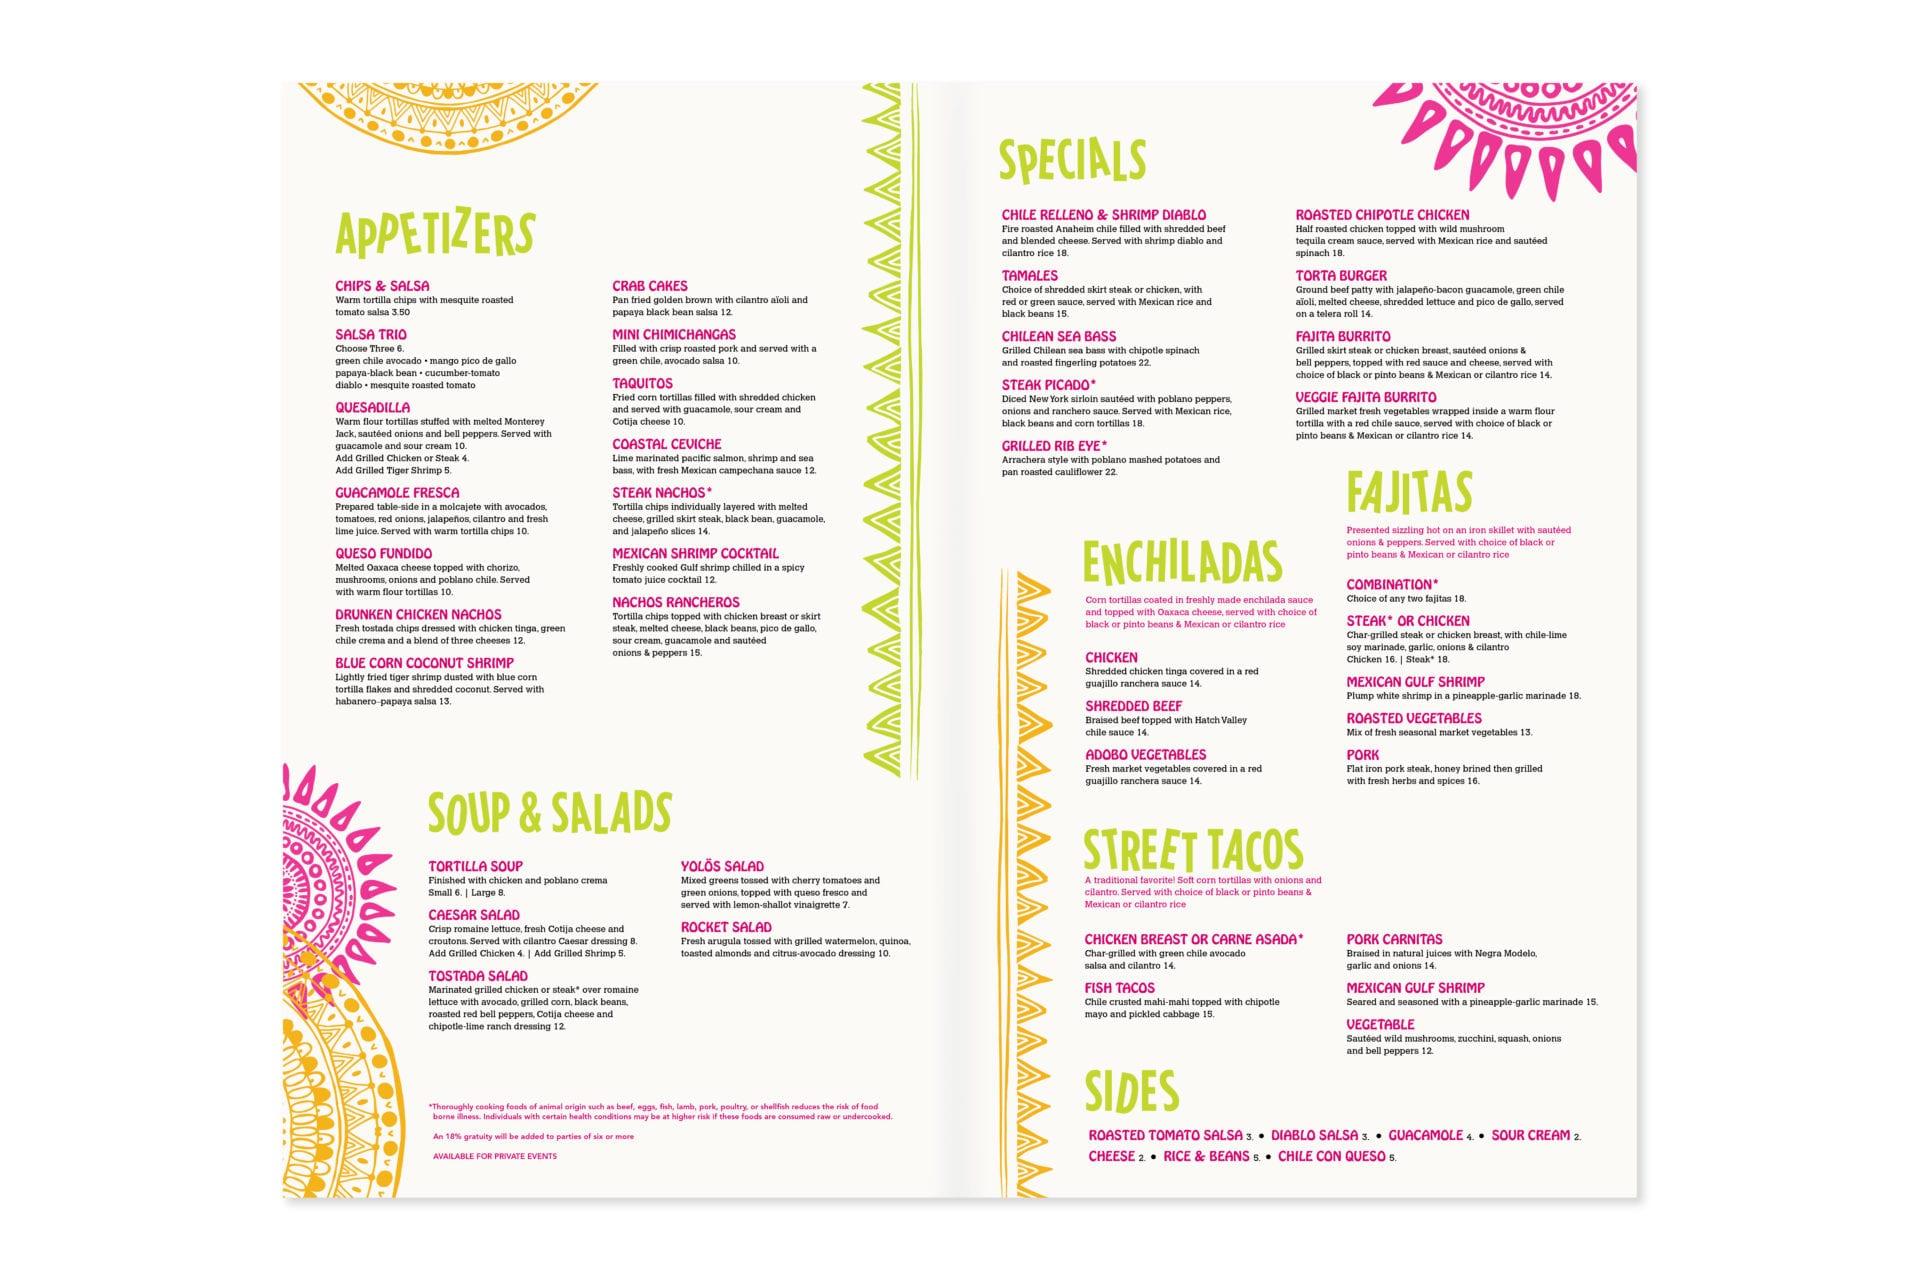 Yolos Mexican Grill menu design, inside